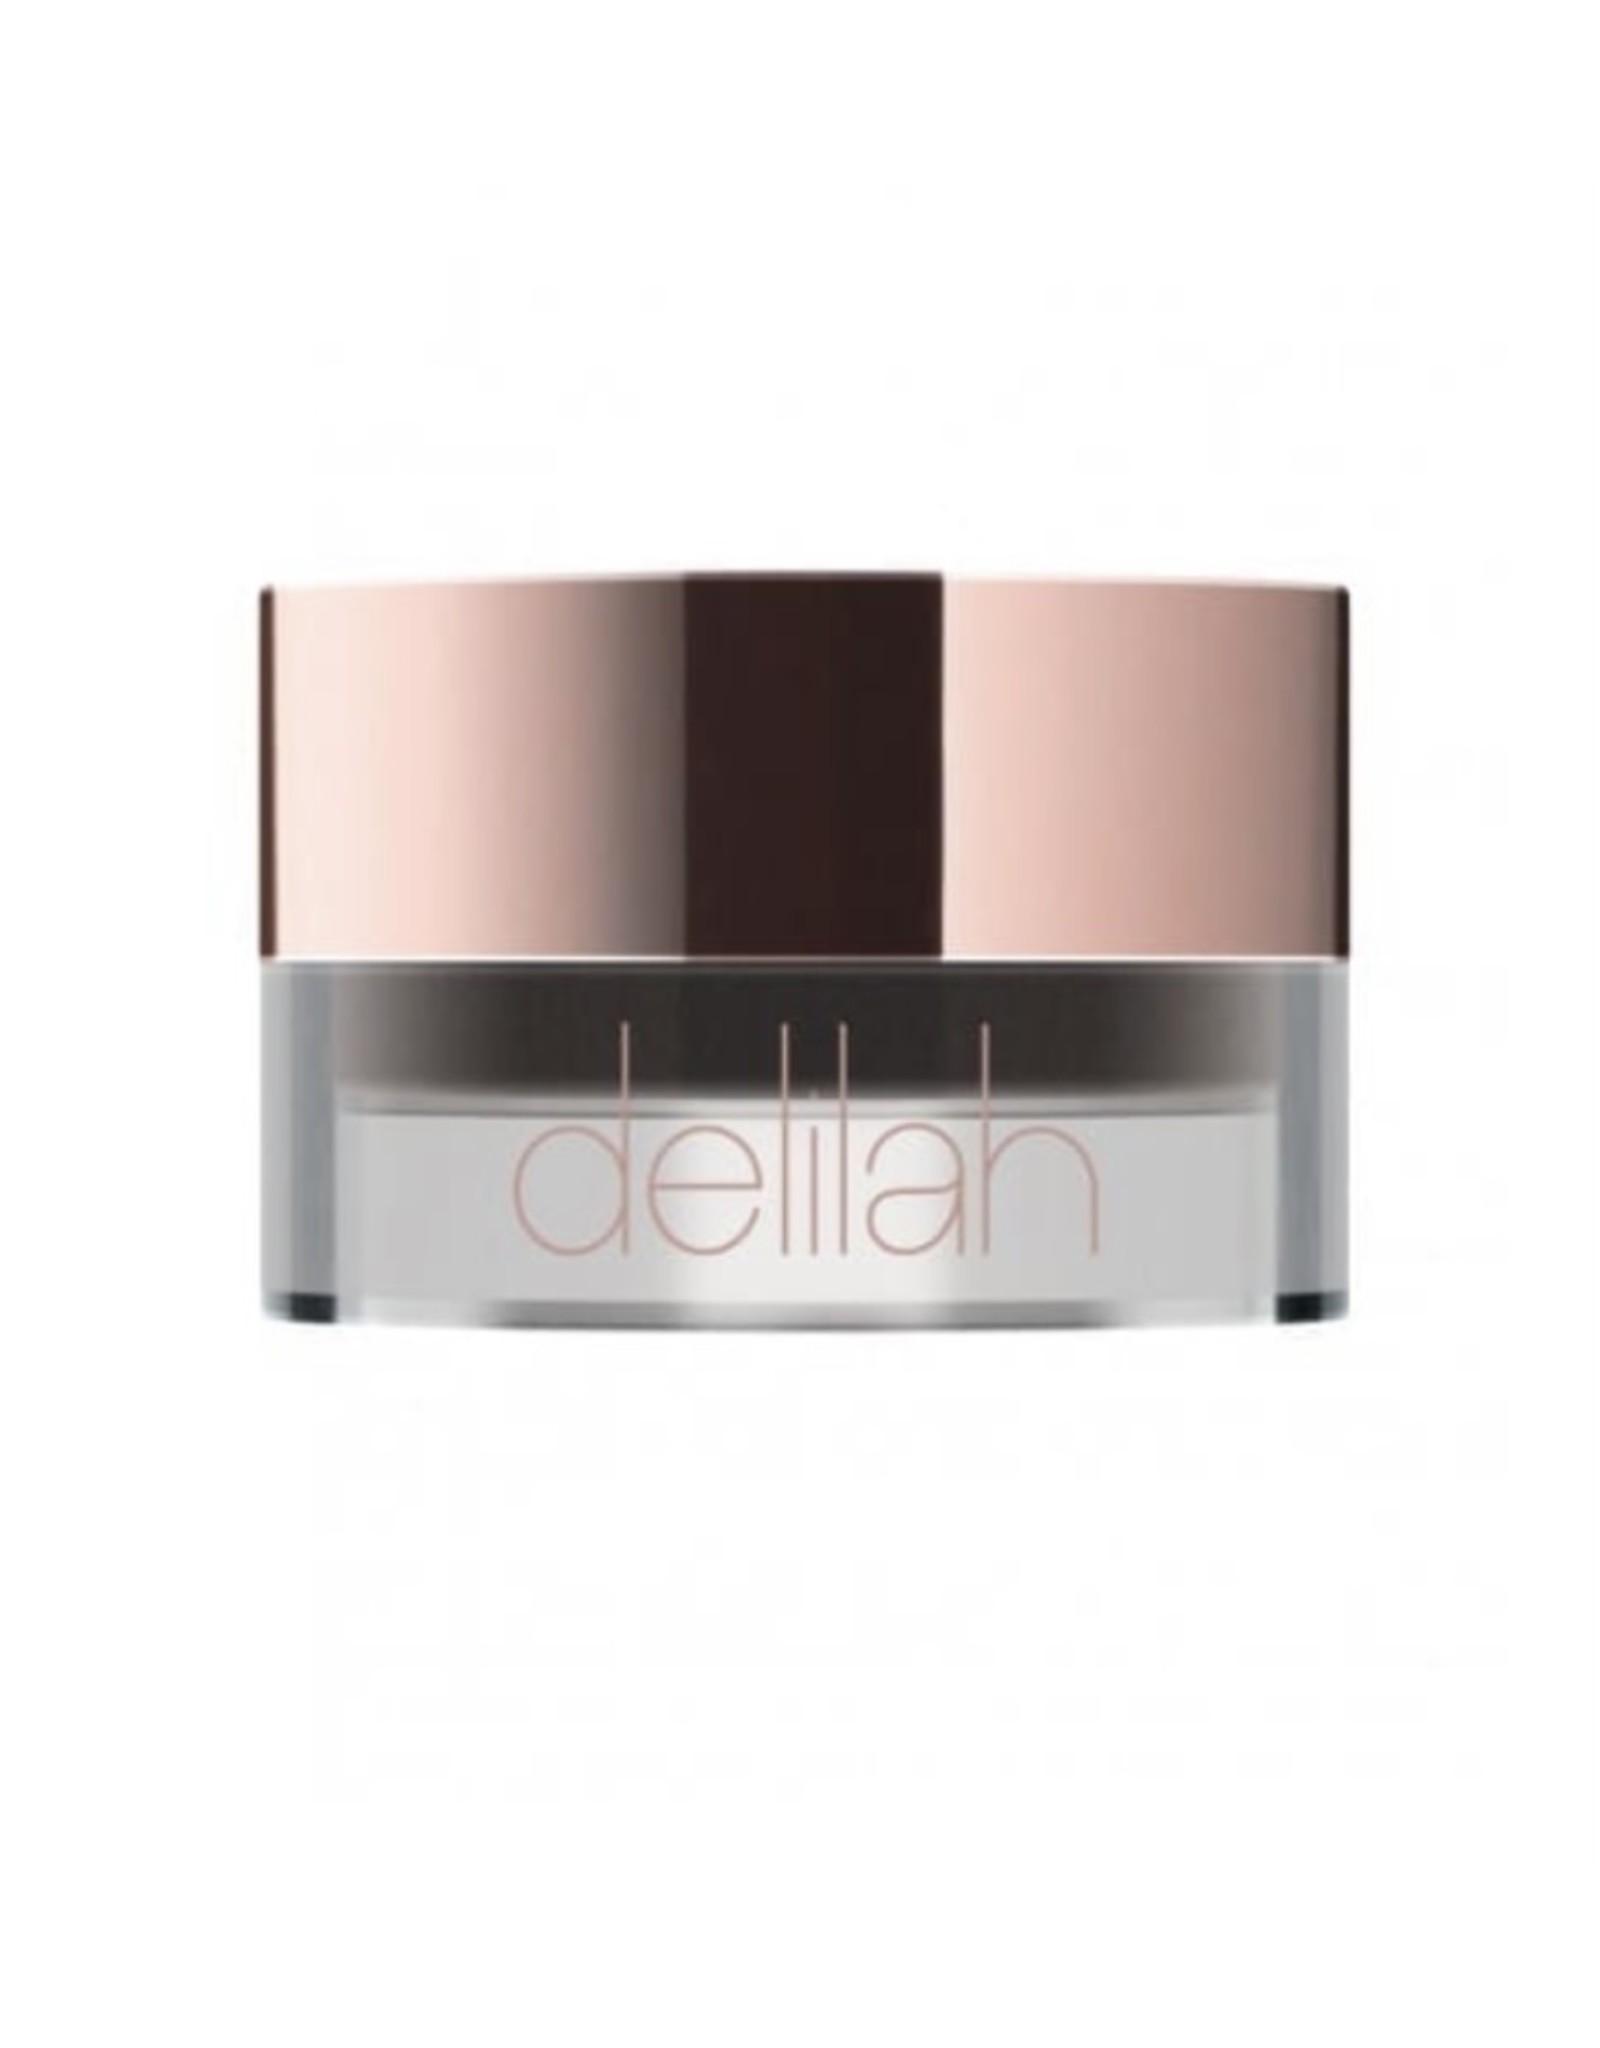 Delilah Gel Line Eye & Brow